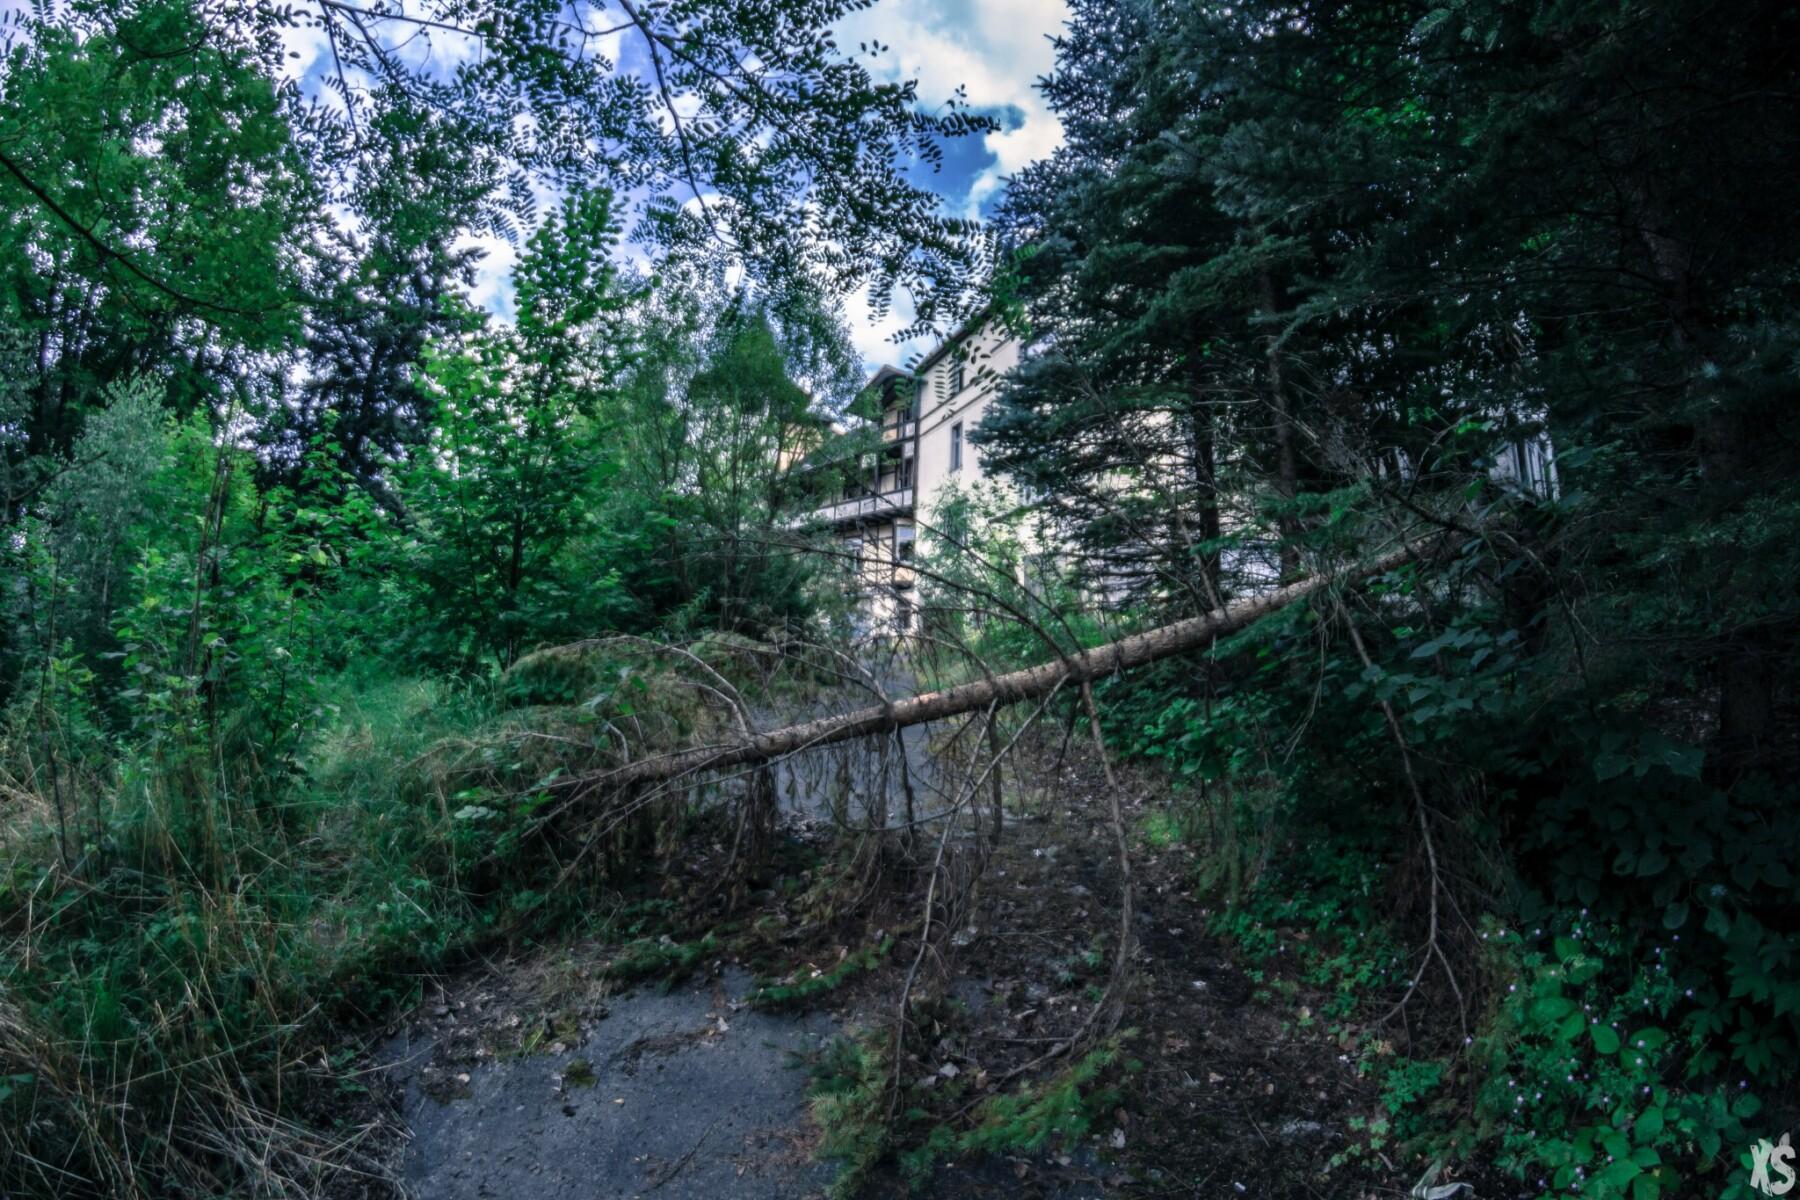 sanatorium-klaas-annink-1